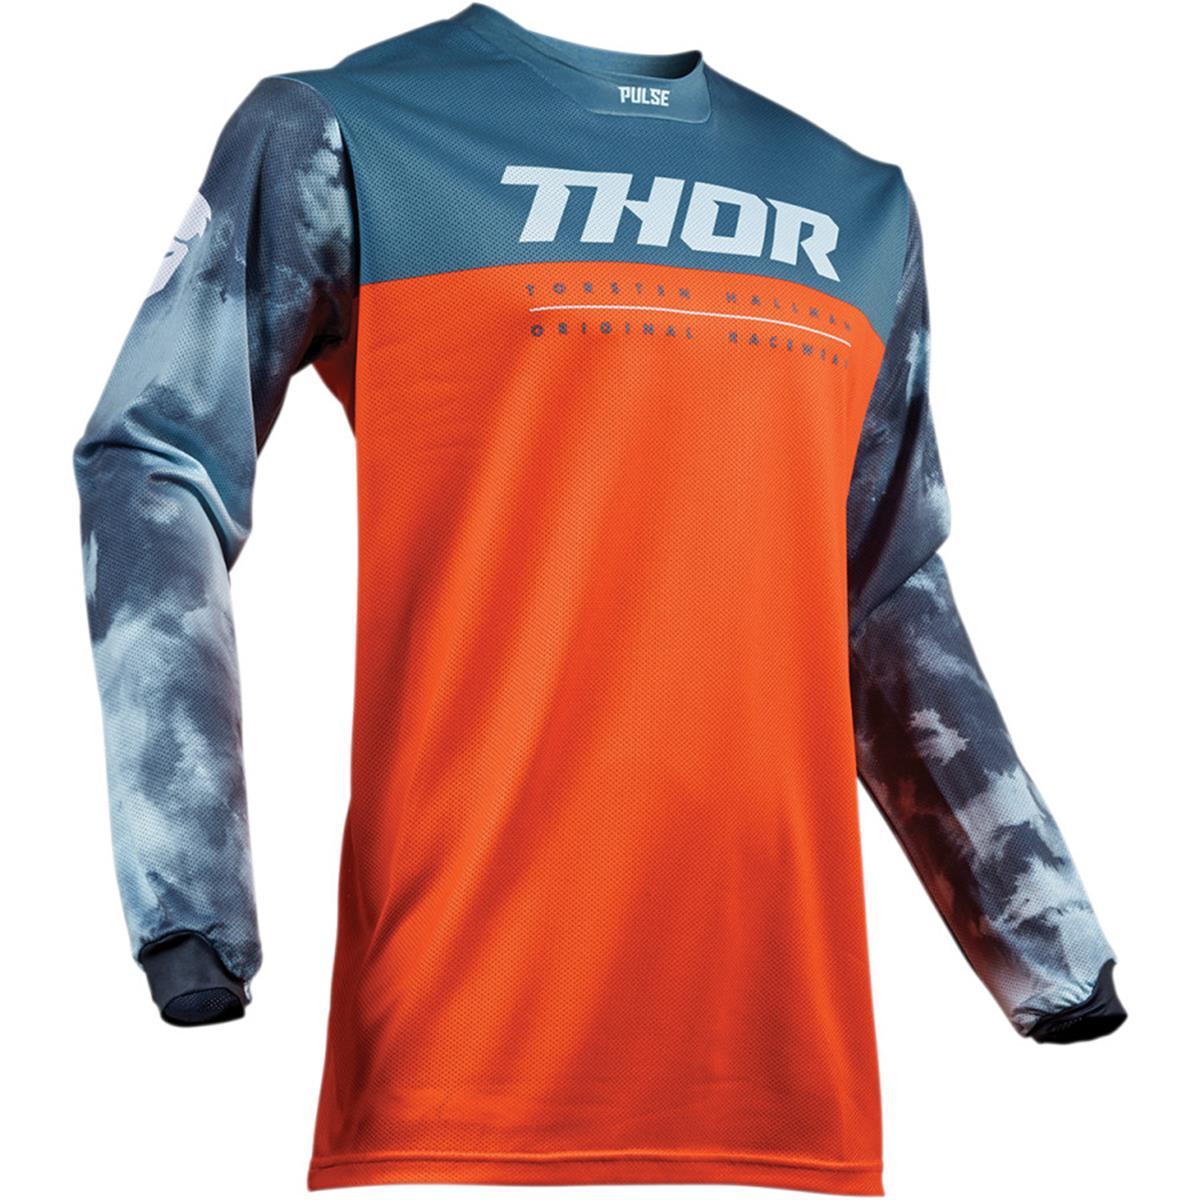 Thor Kids Jersey Pulse Air Acid - Rot Orange/Slate